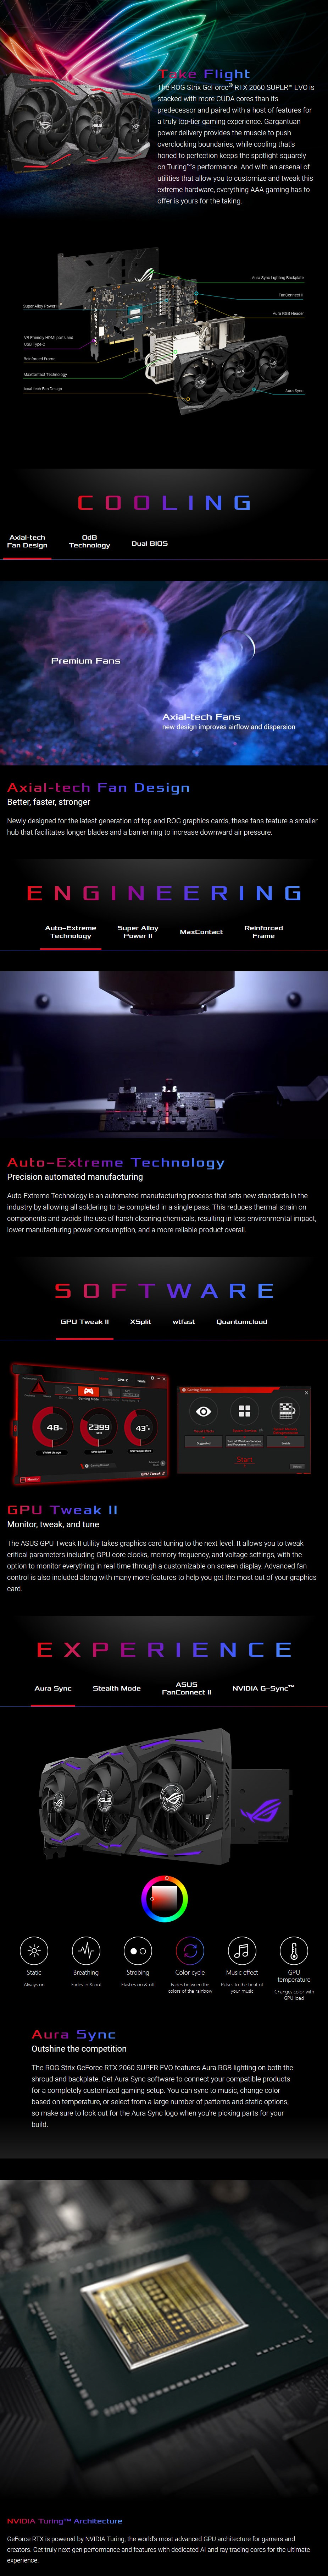 asus-geforce-rtx-2060-super-rog-strix-evo-gaming-advanced-8gb-video-card-ac33954-7.jpg